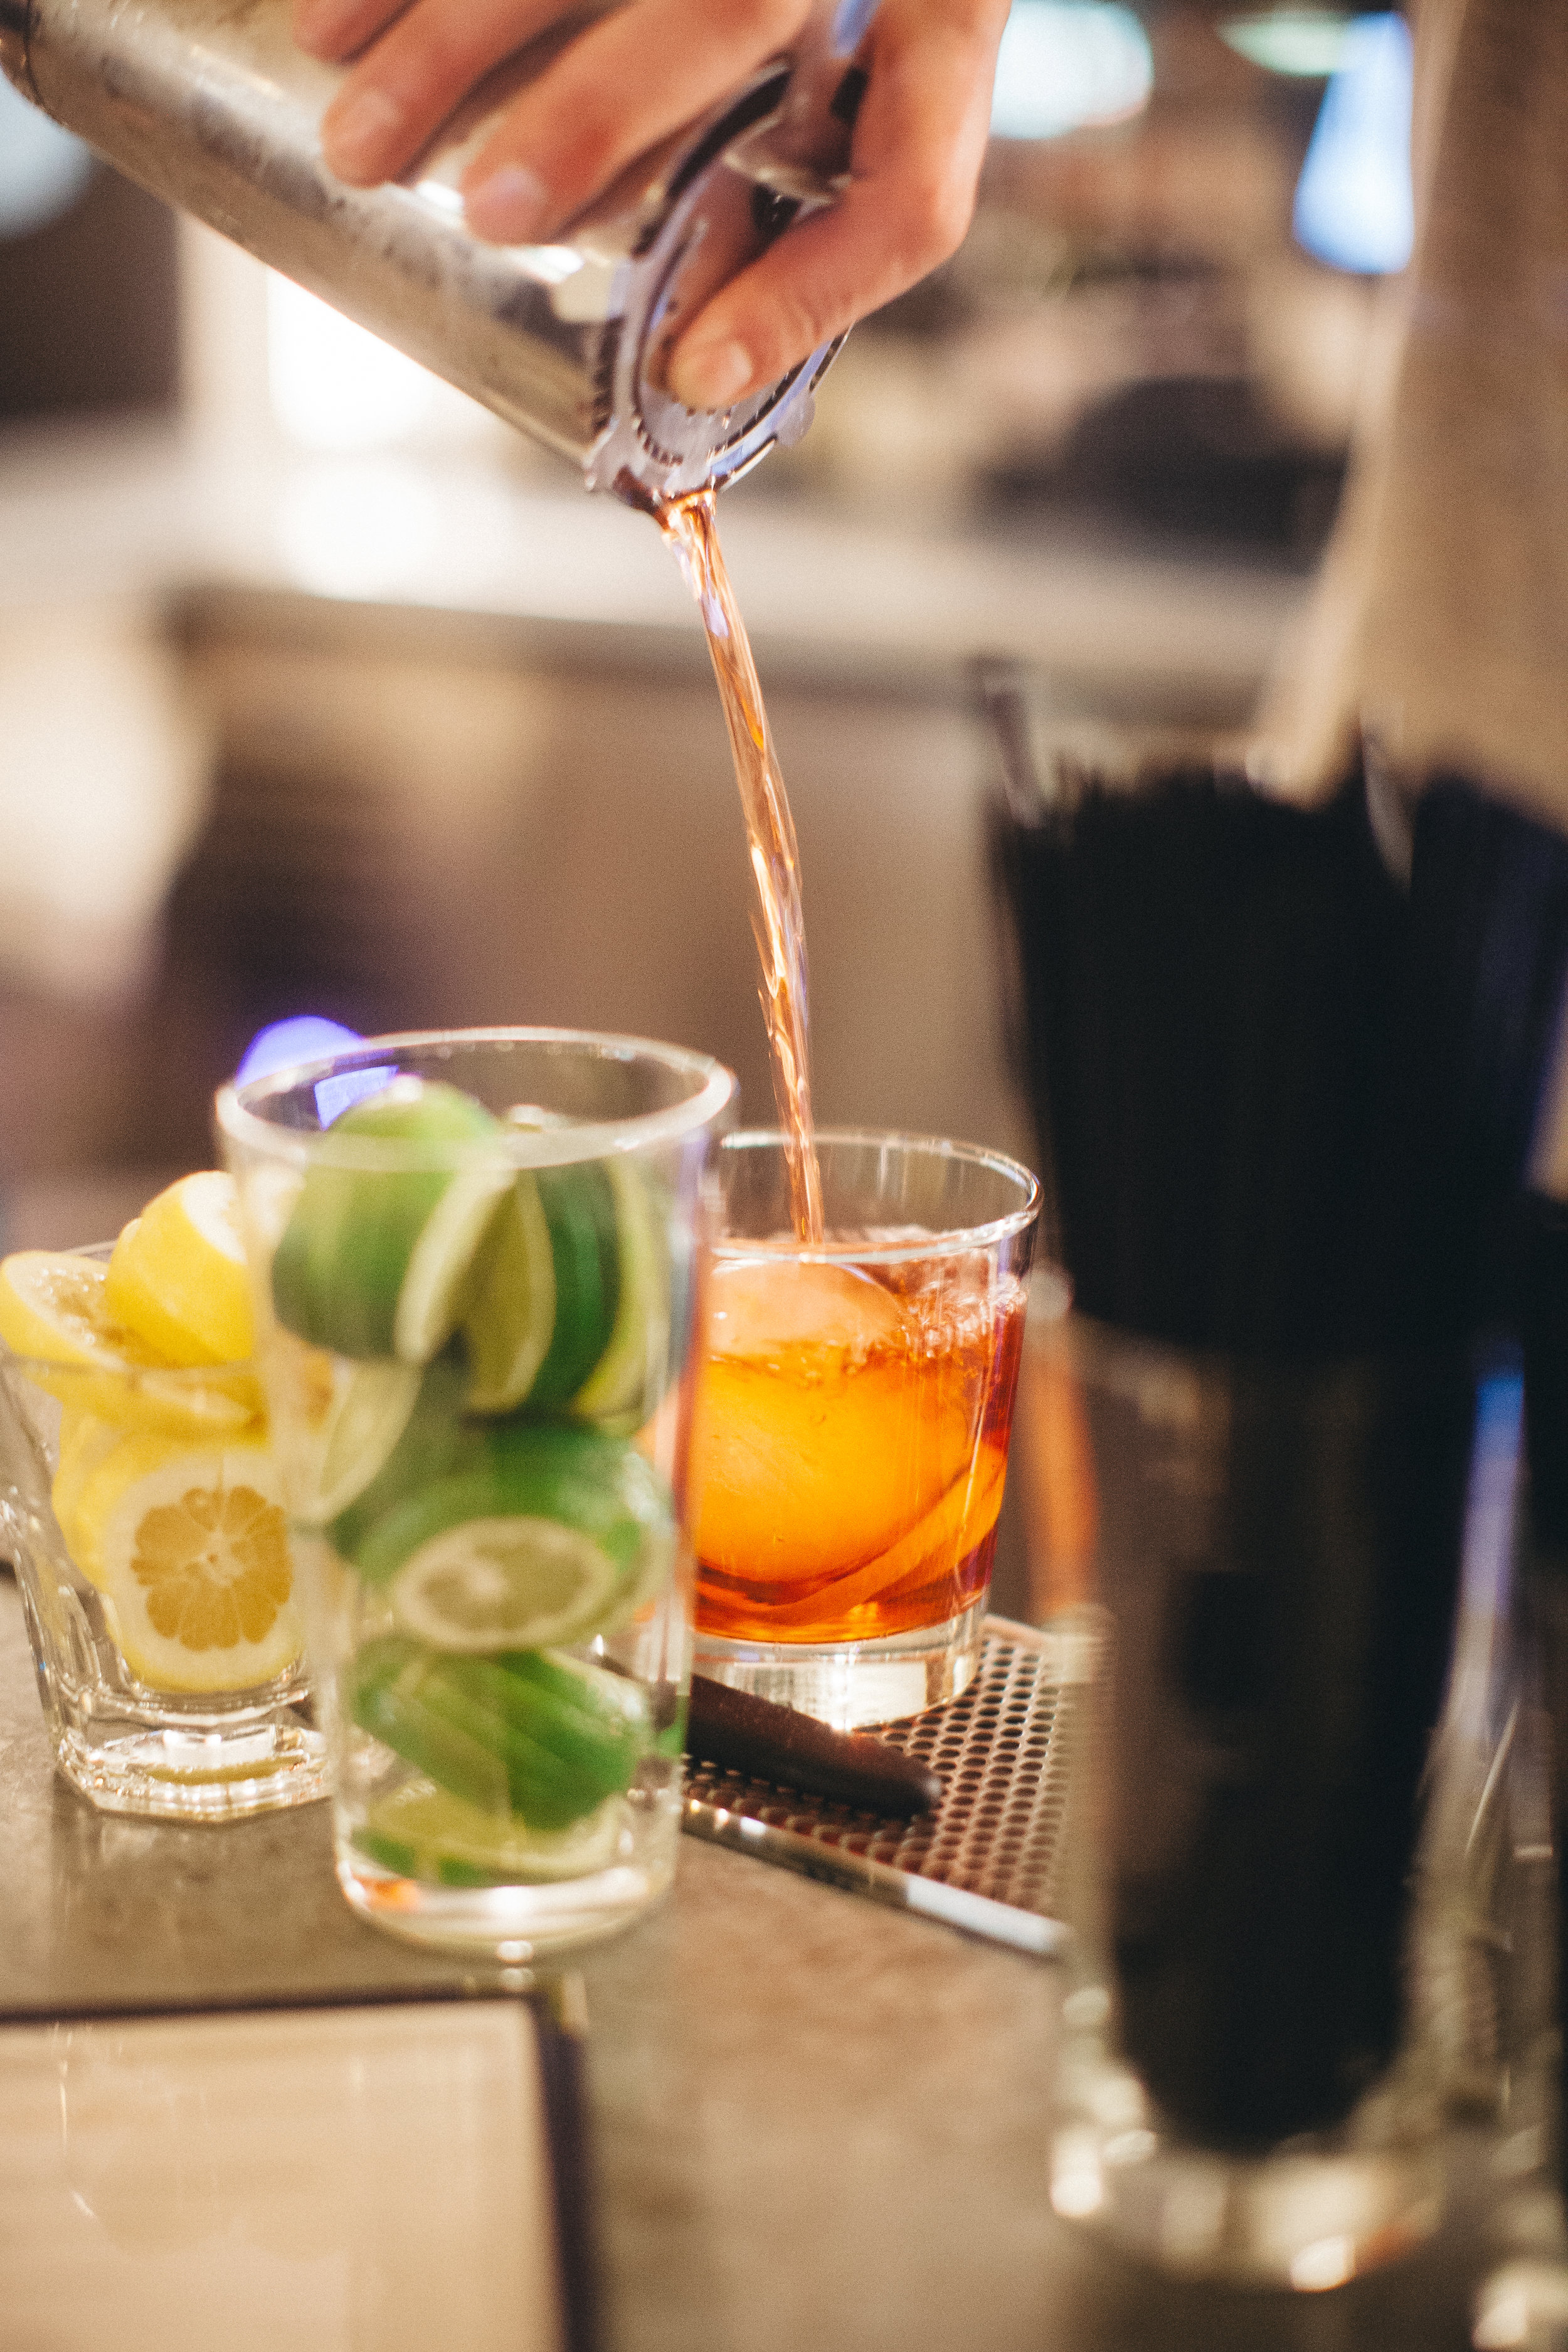 Negroni. Gin, sweet vermouth and Campari.